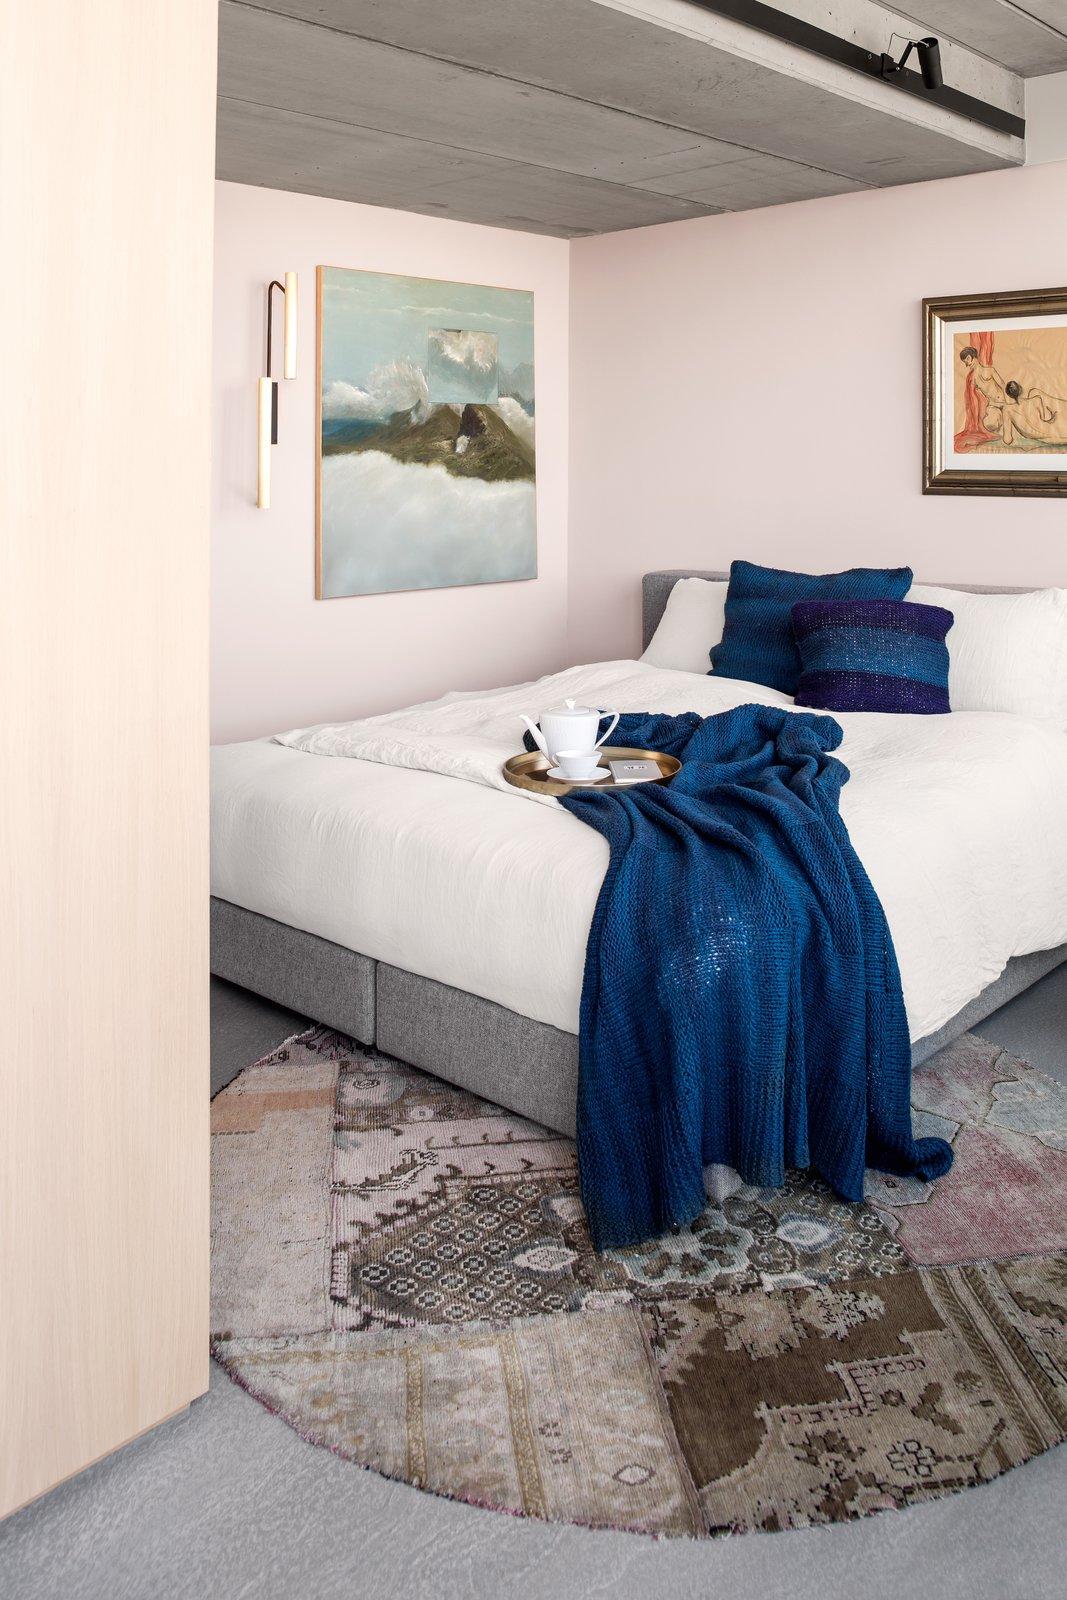 Ester's Apartment 2.0 by Ester Bruzkus Bedroom